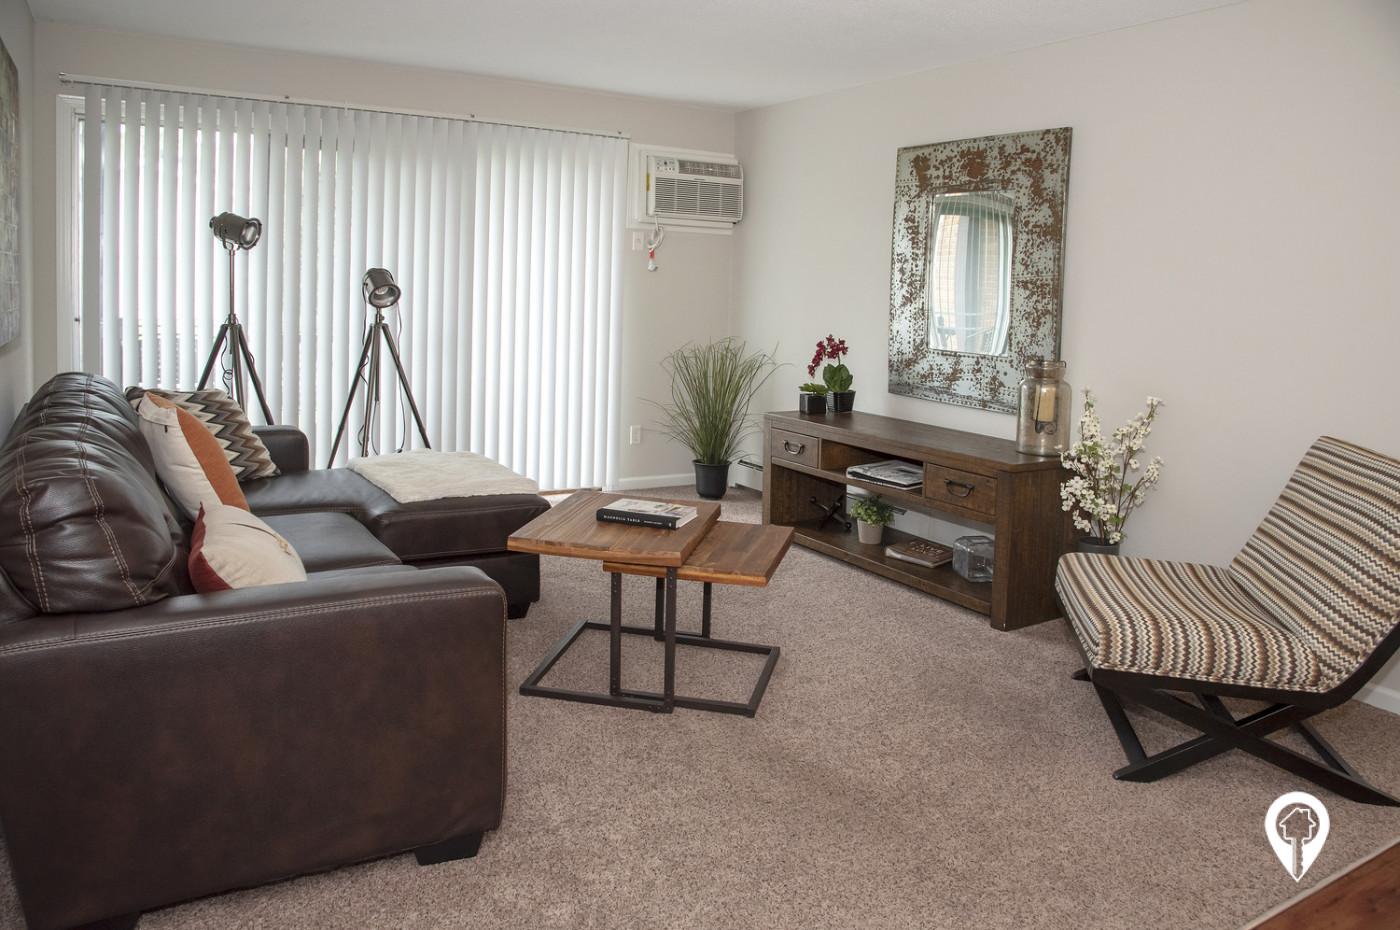 Colonial-Villa-Apartments-Wide-Patio-Doors-Provide-Ample-Natural-Lighting